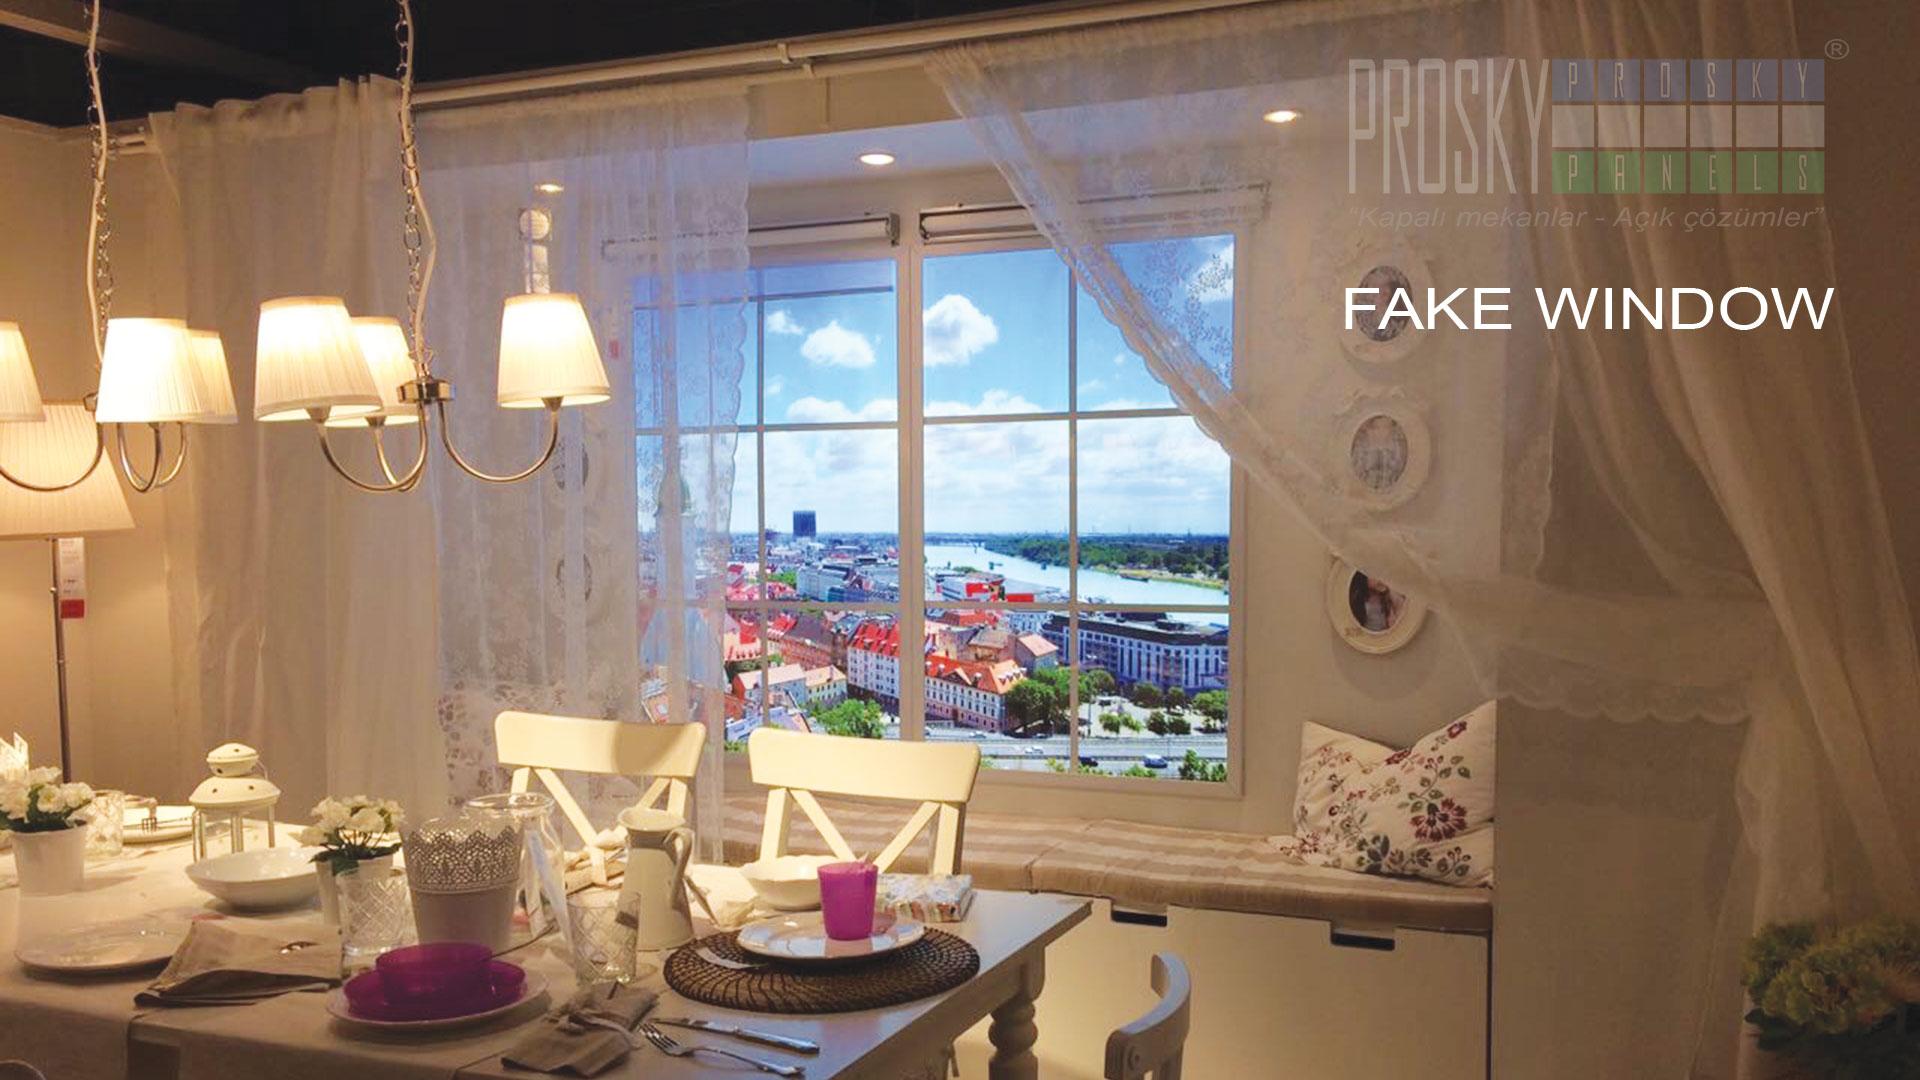 Sky Panels Fake Window Luminous Virtual Window Led